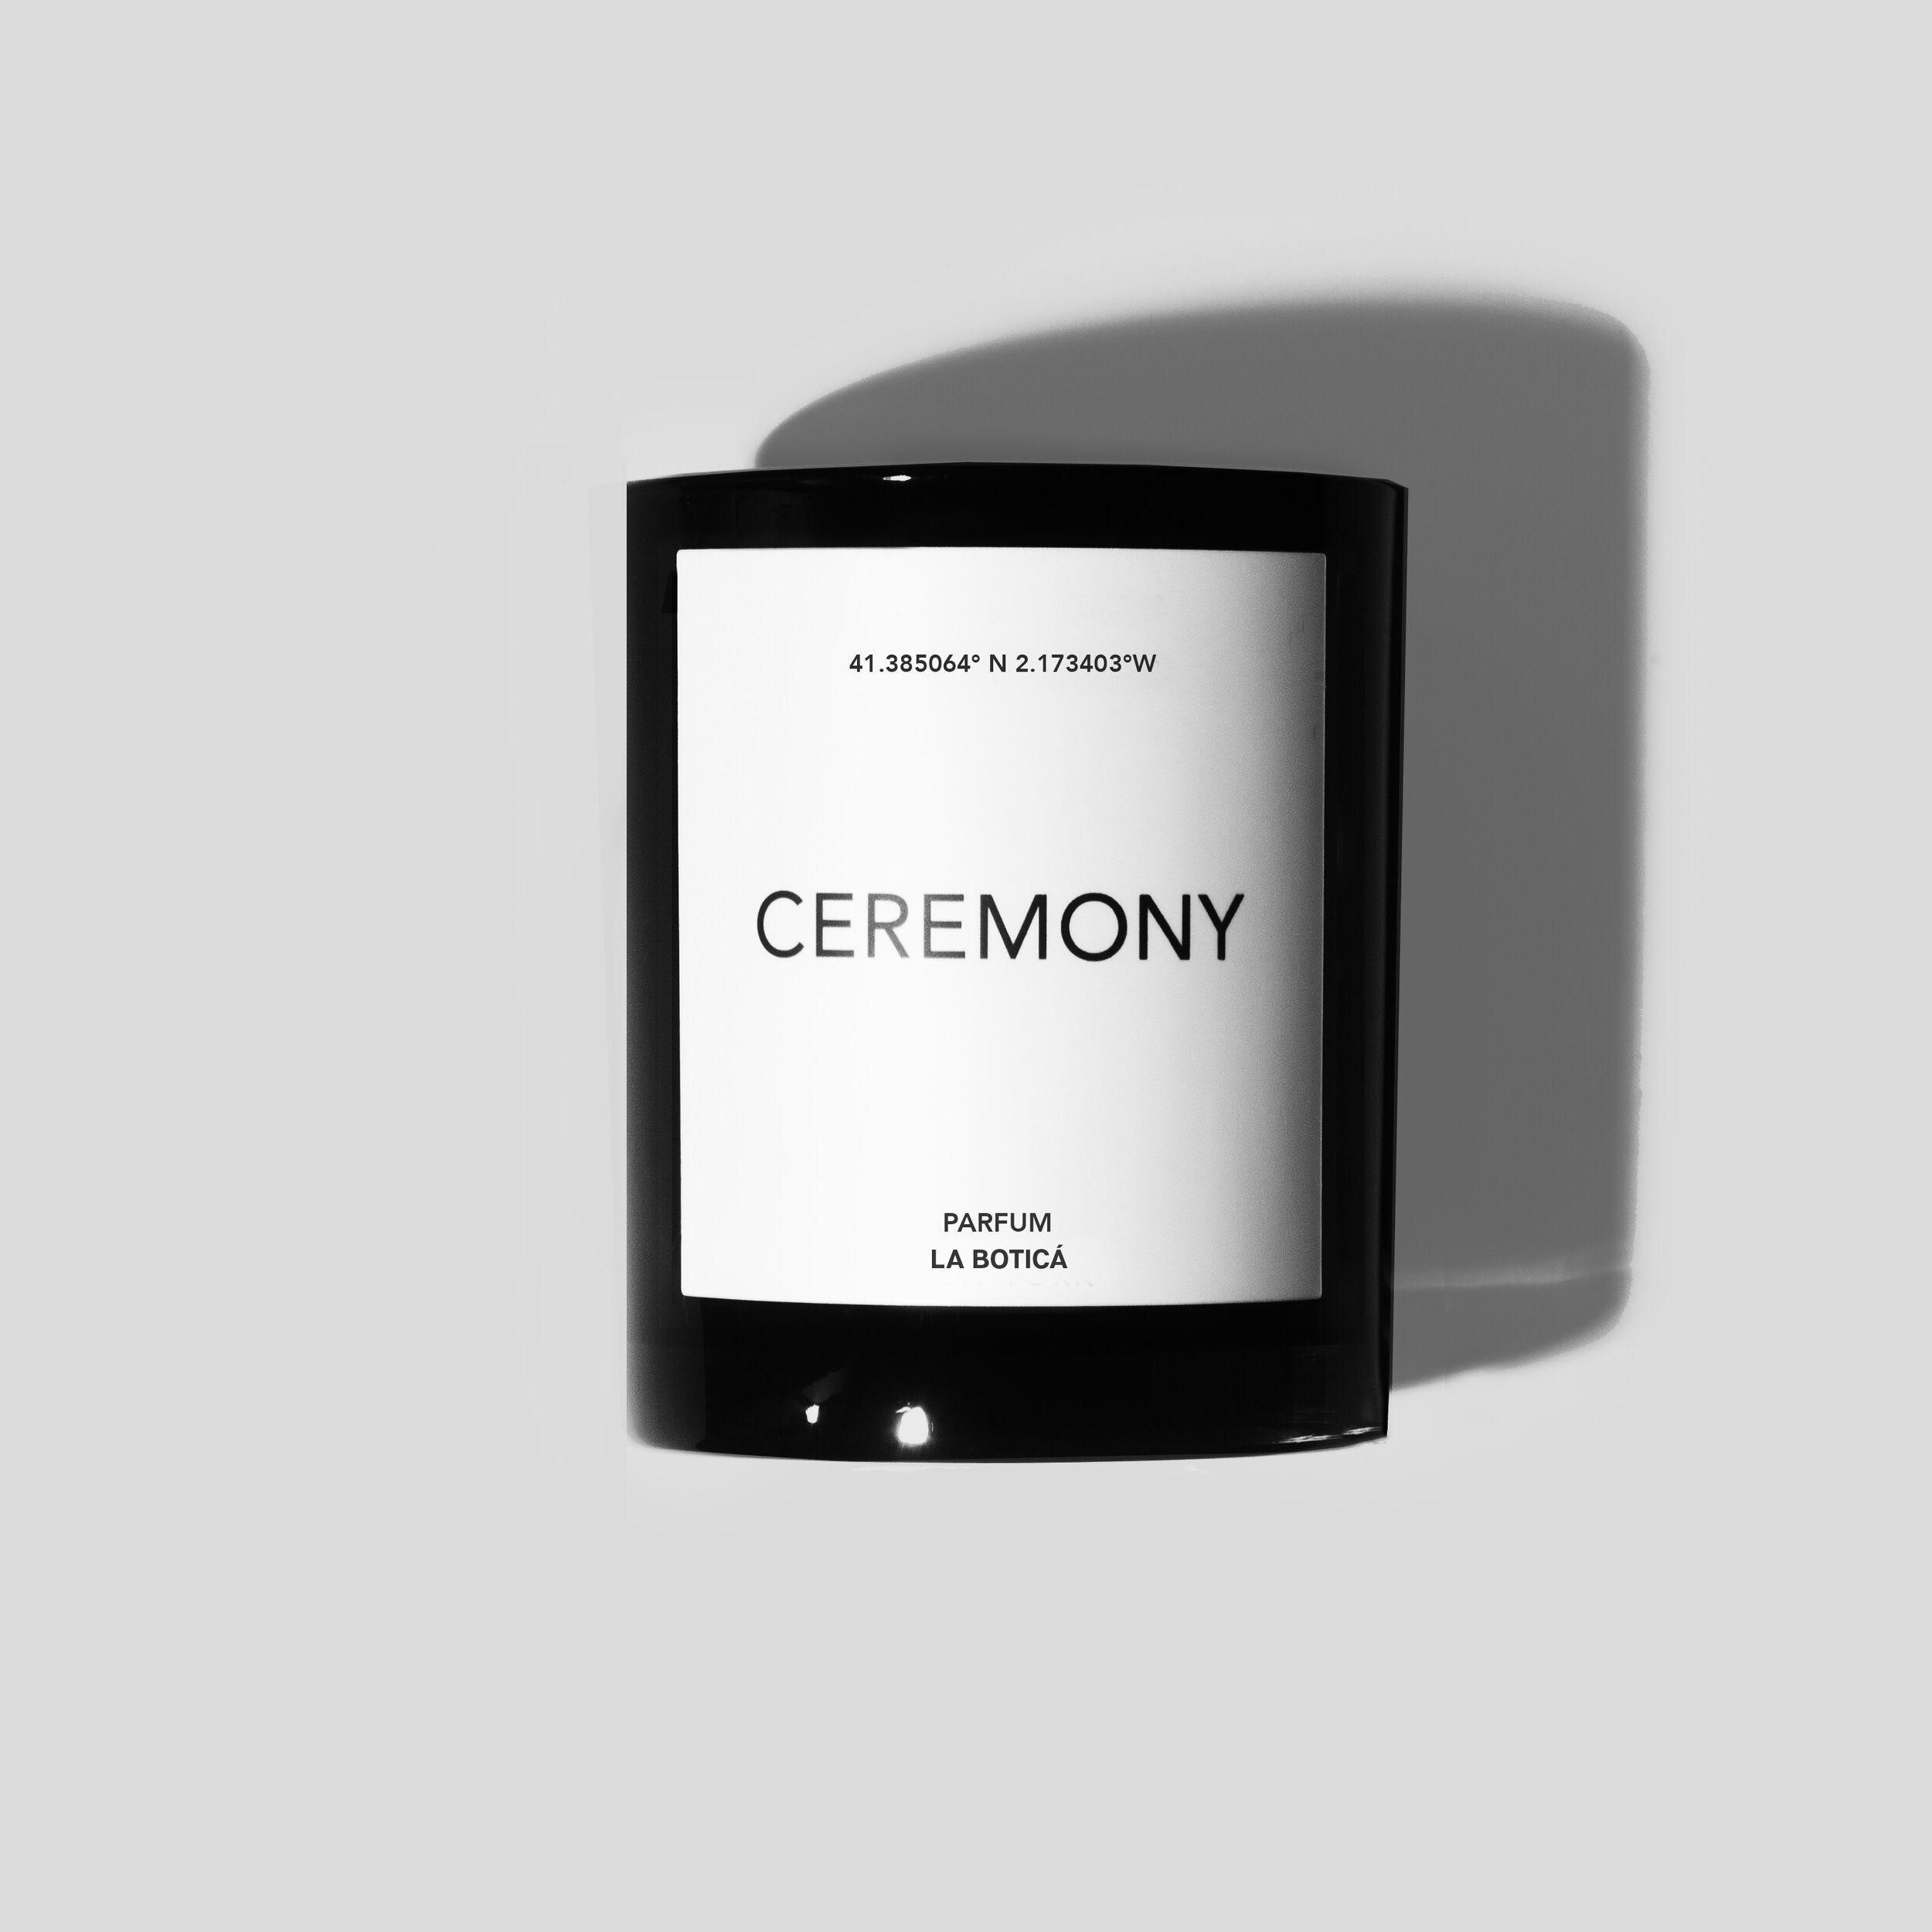 La Botica Ceremony Candle